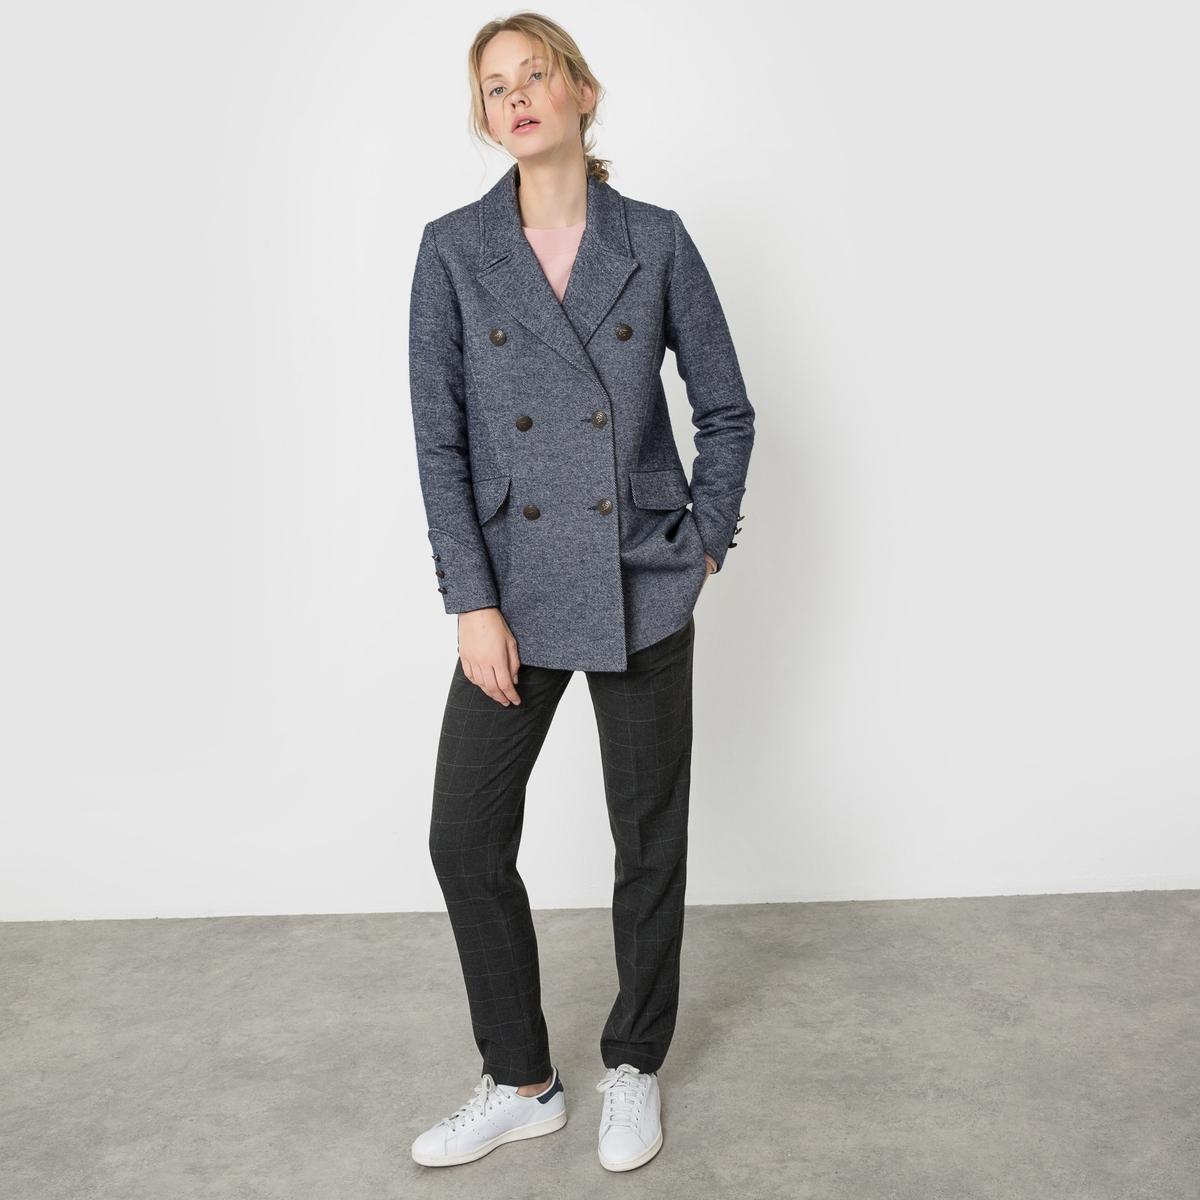 Пальто-бушлат из меланжевого трикотажа от La Redoute